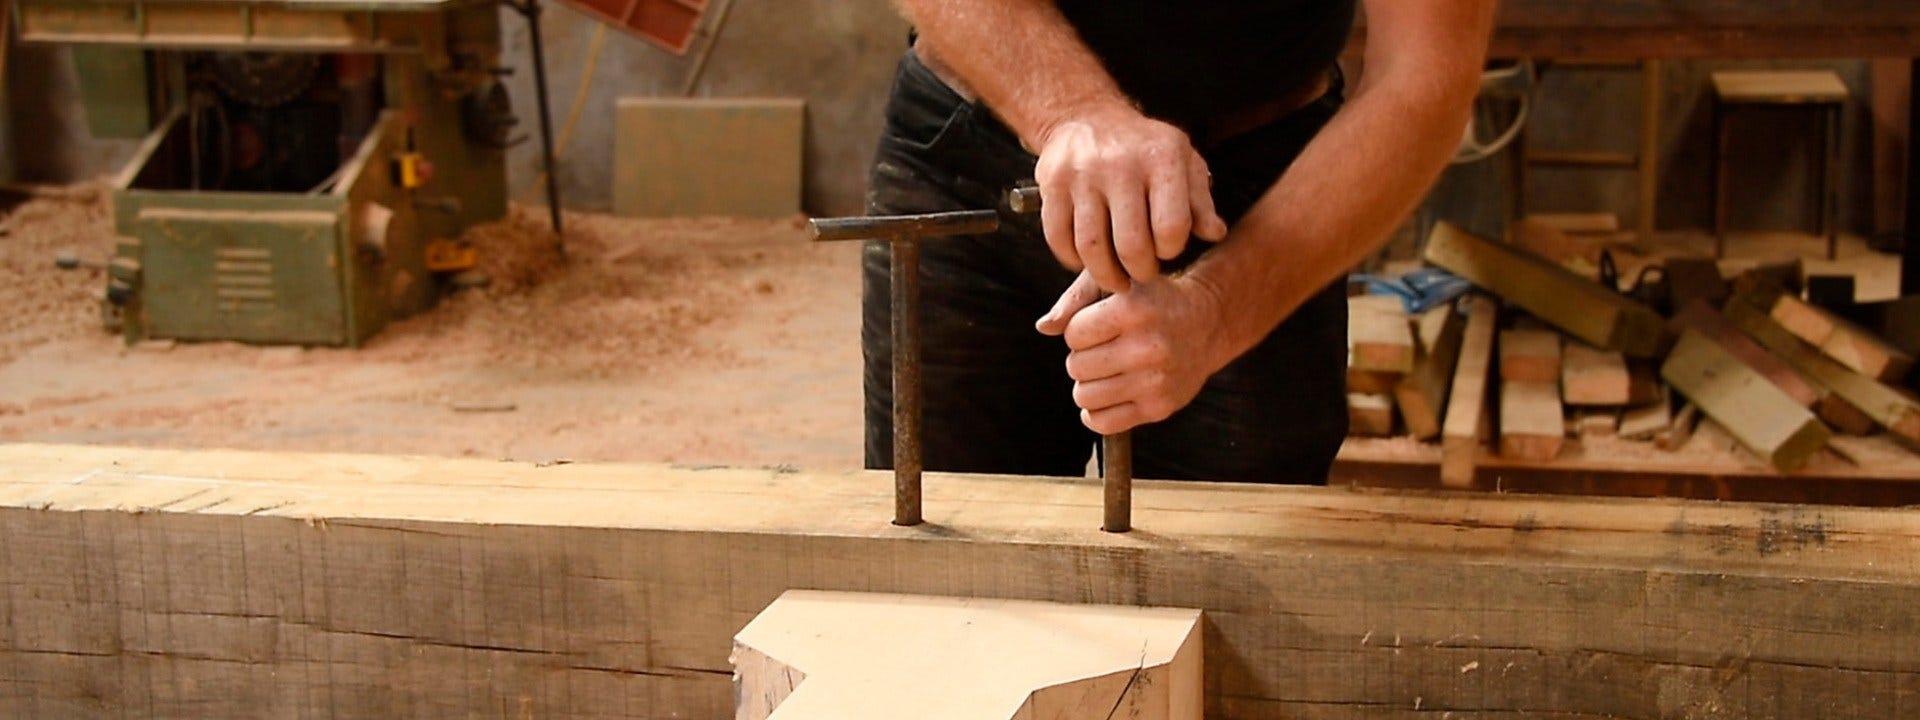 Wood-Mizer LT40 owner at his carpentry shop